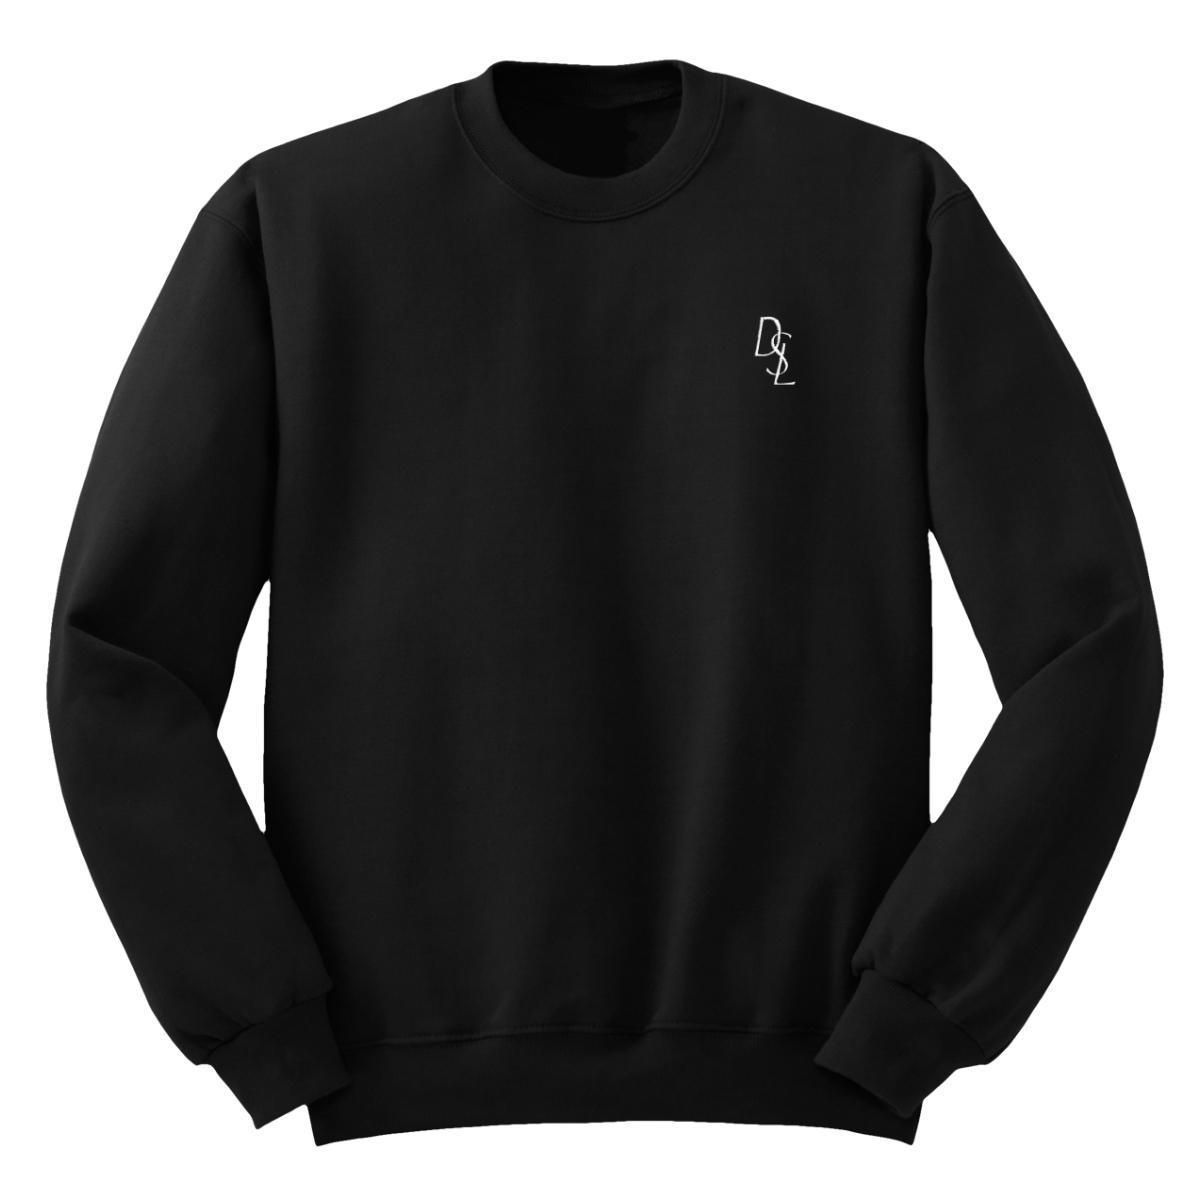 DSL Embroidered Crew Sweatshirt [Black/White]